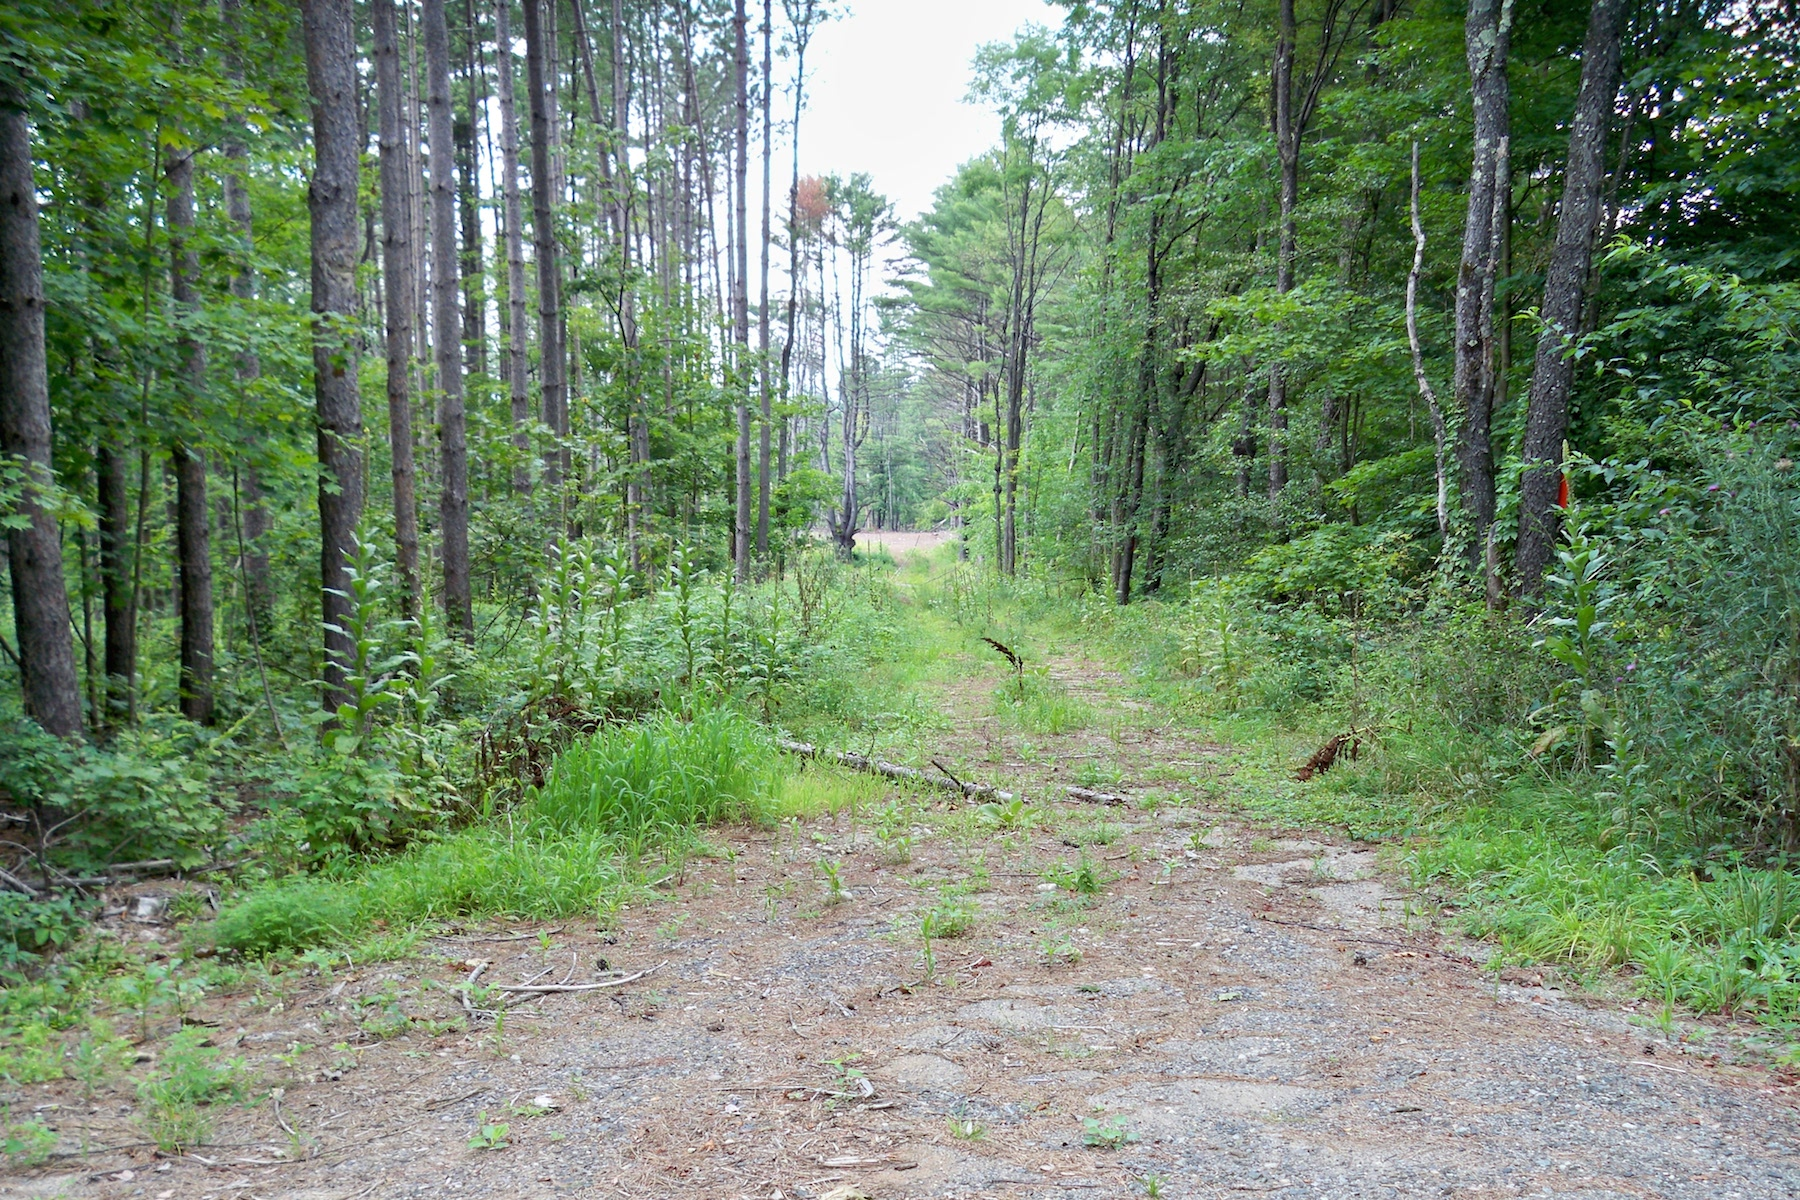 土地 为 销售 在 155 Squashville Rd, Greenfield, NY 12833 155 Squashville Rd 格林菲尔德, 纽约州 12833 美国